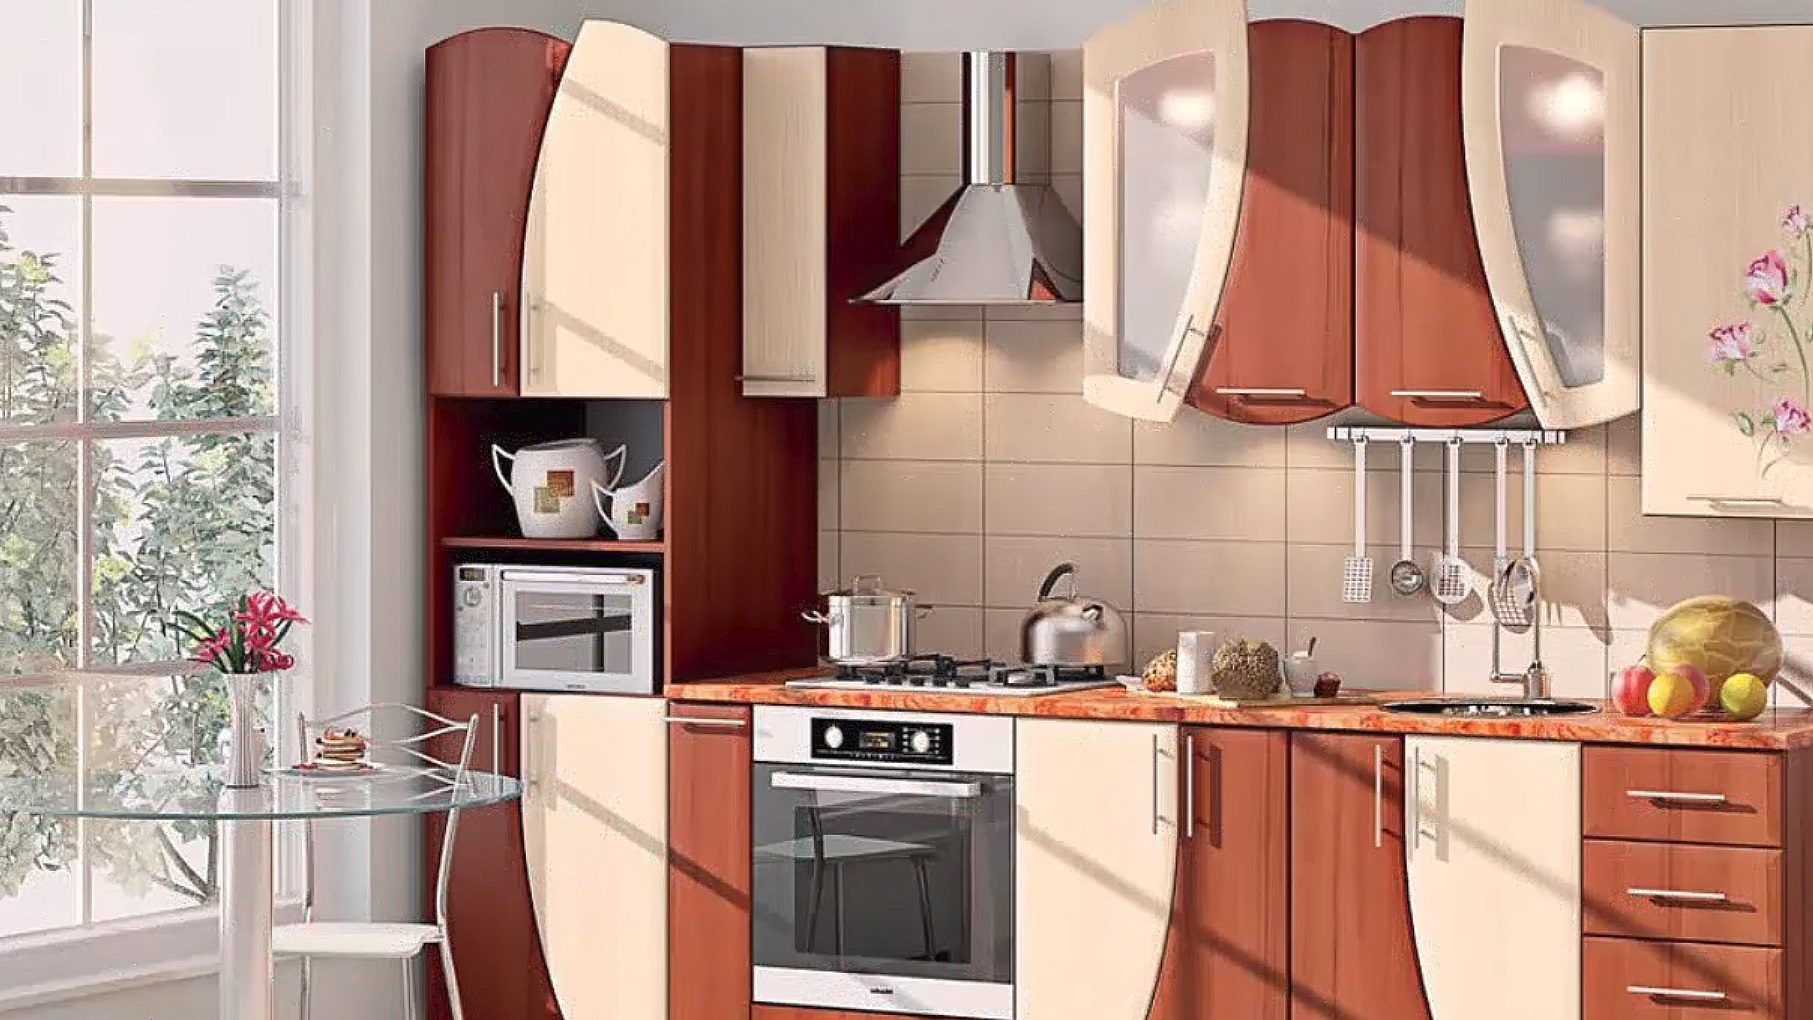 cocina-moderna-y-pequena